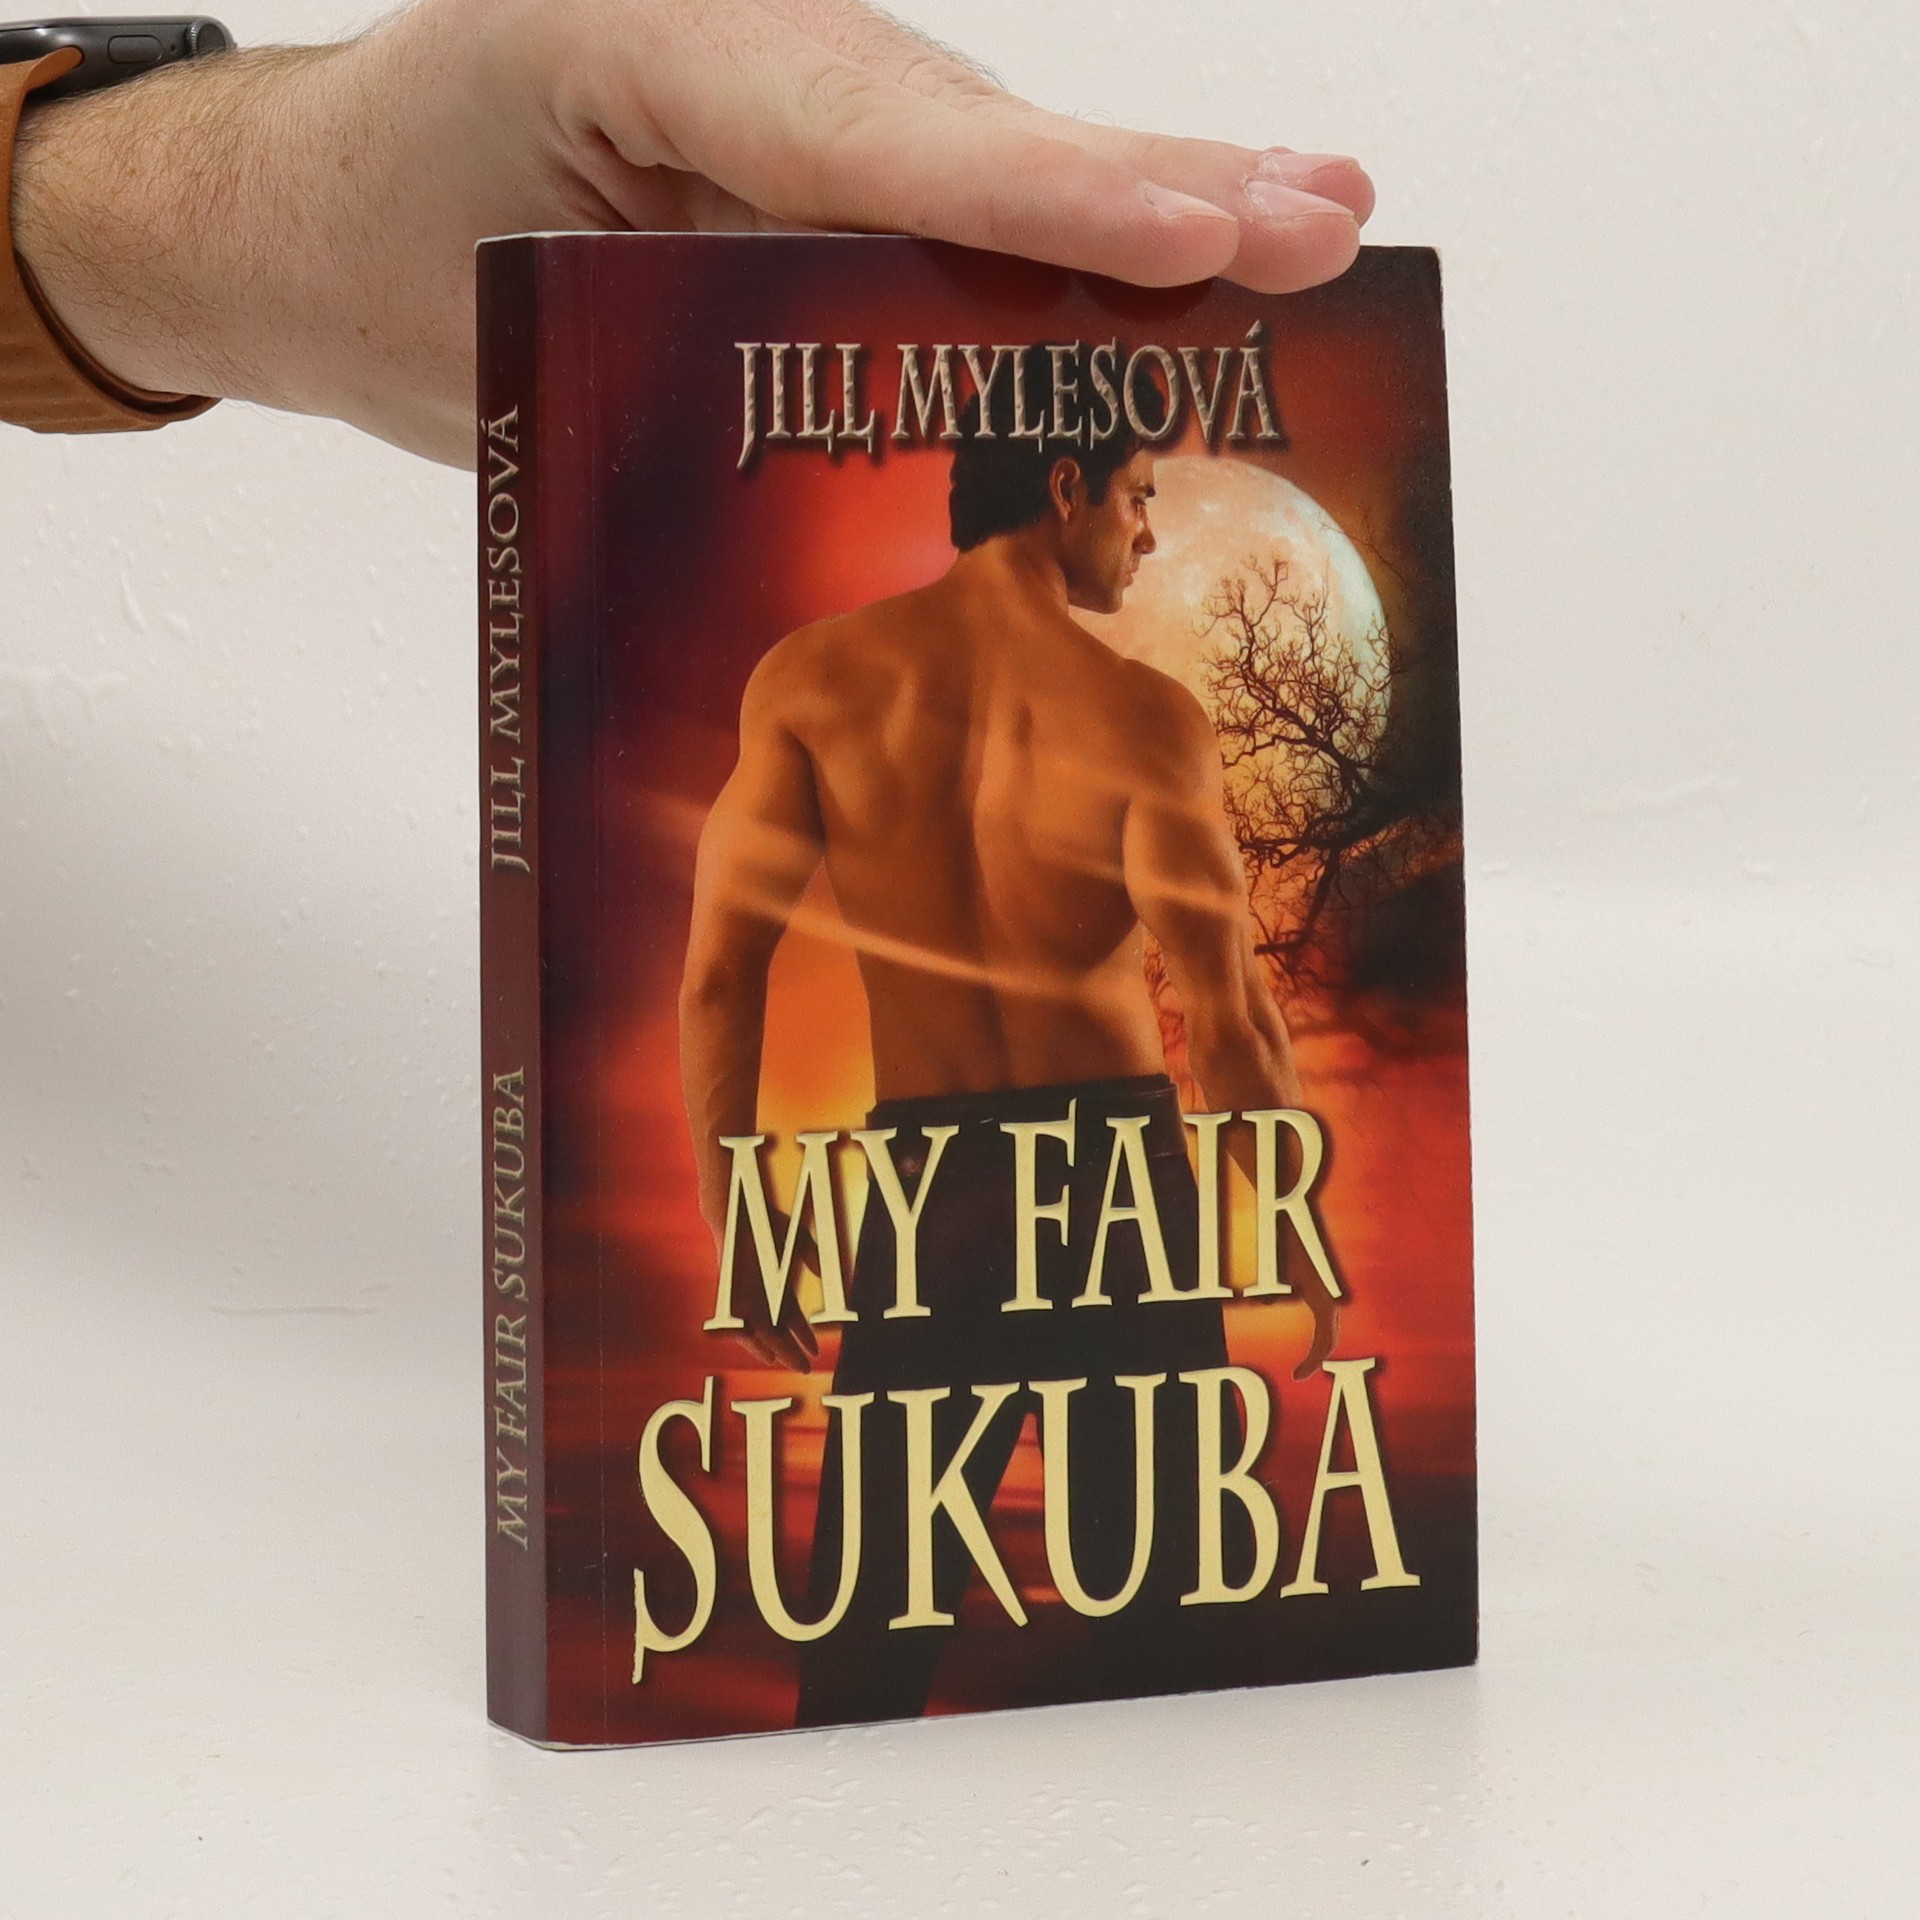 antikvární kniha My fair sukuba, 2012